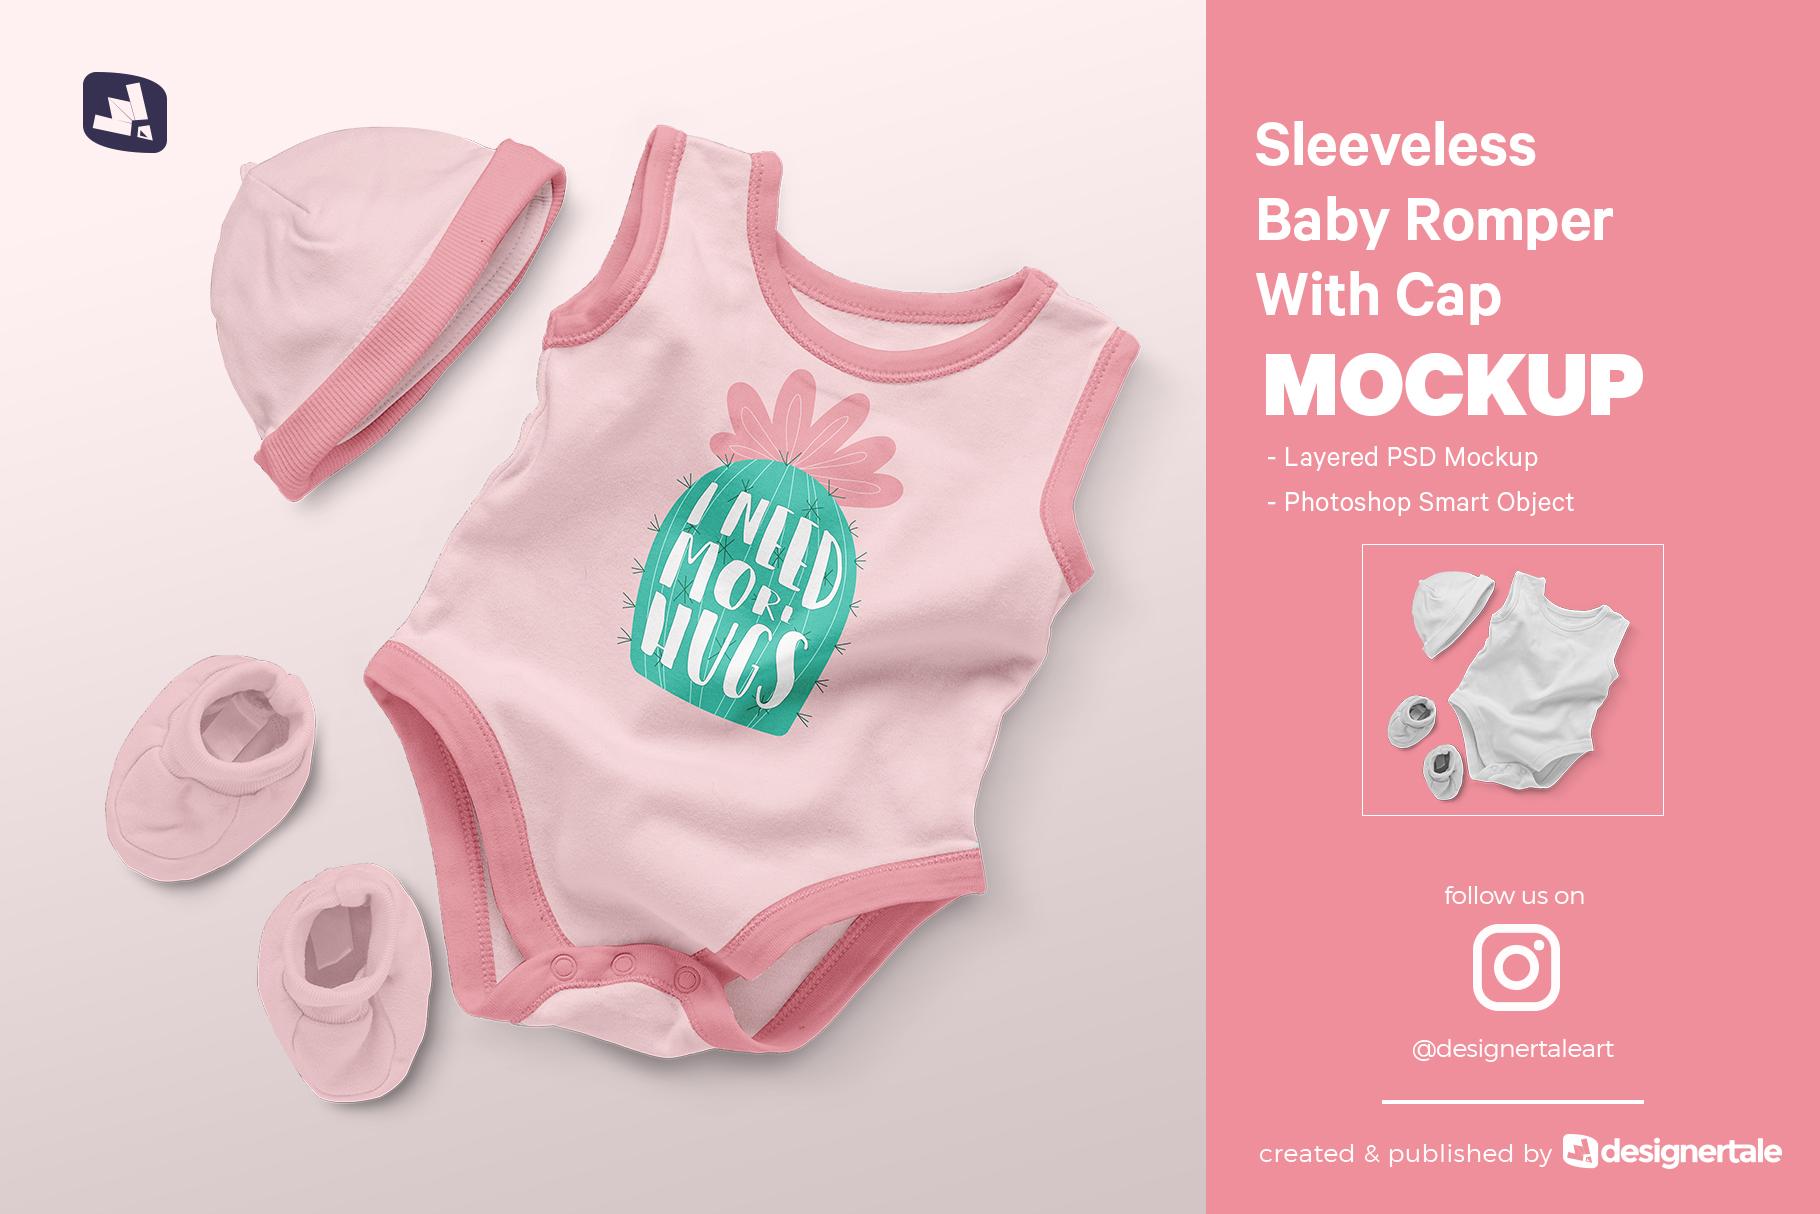 baby romper with cap mockup